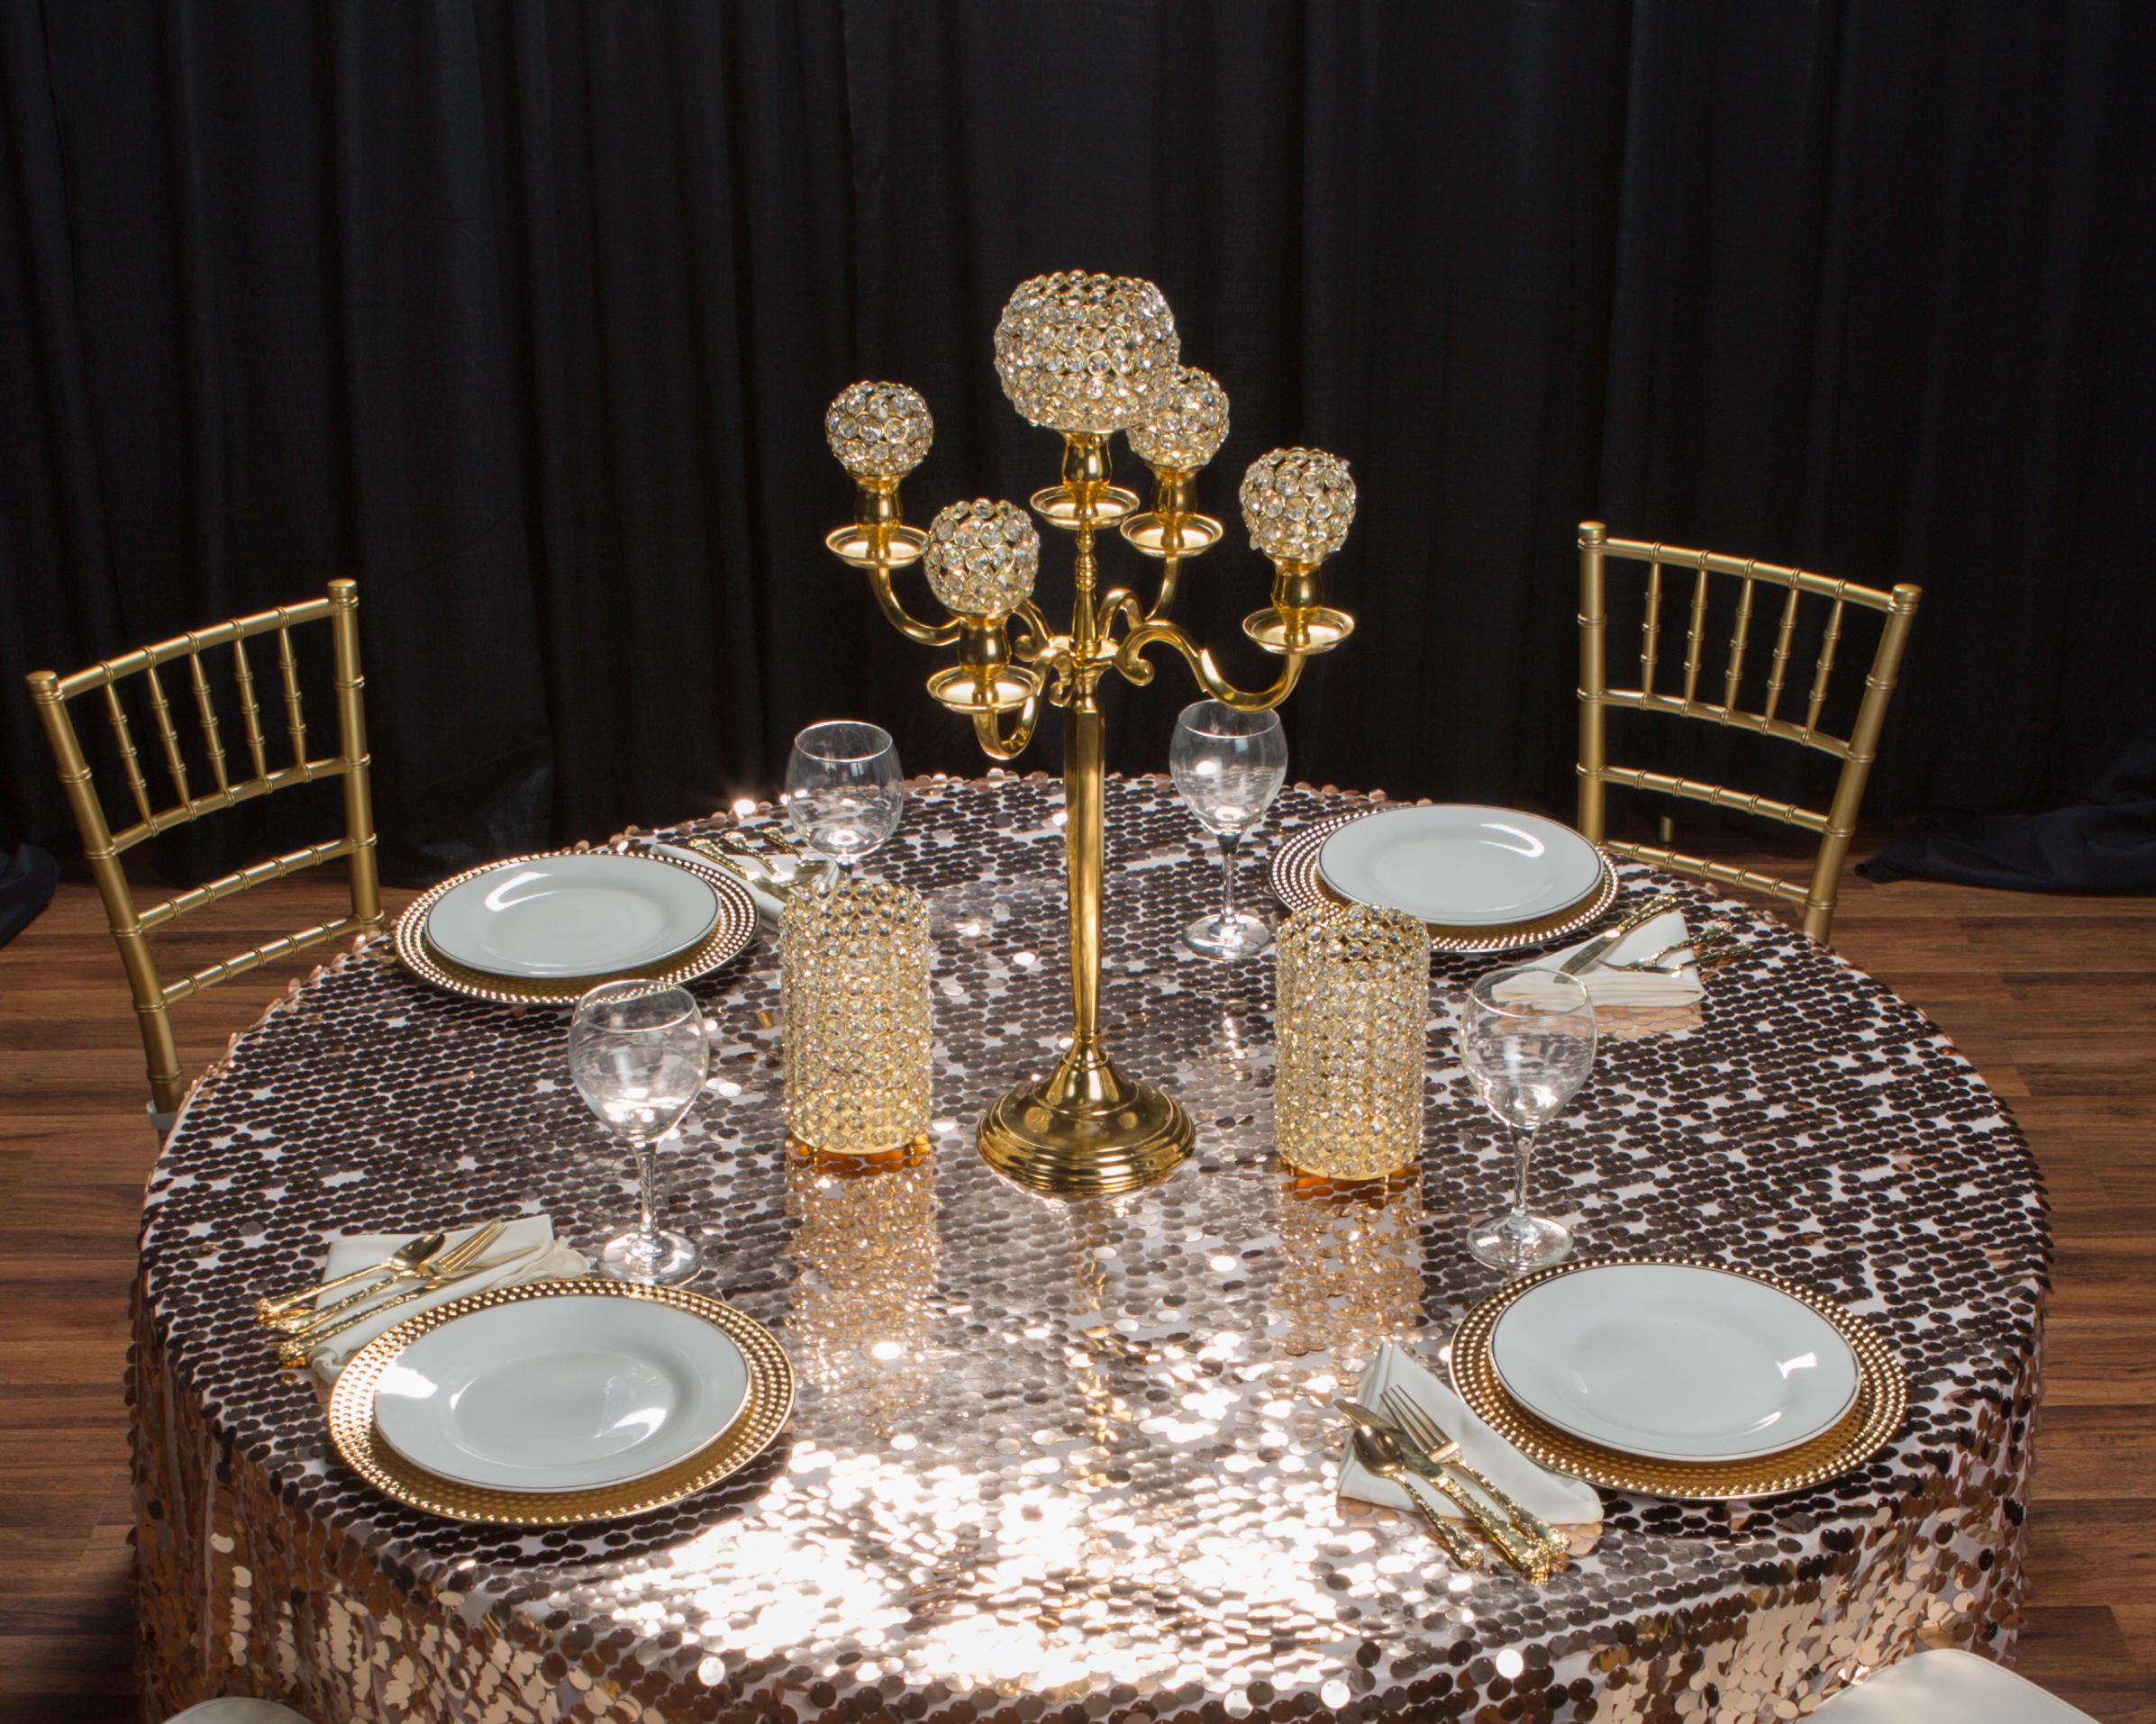 Terrific 3 Reasons To Choose Chiavari Chairs For Your Wedding Rentals Machost Co Dining Chair Design Ideas Machostcouk